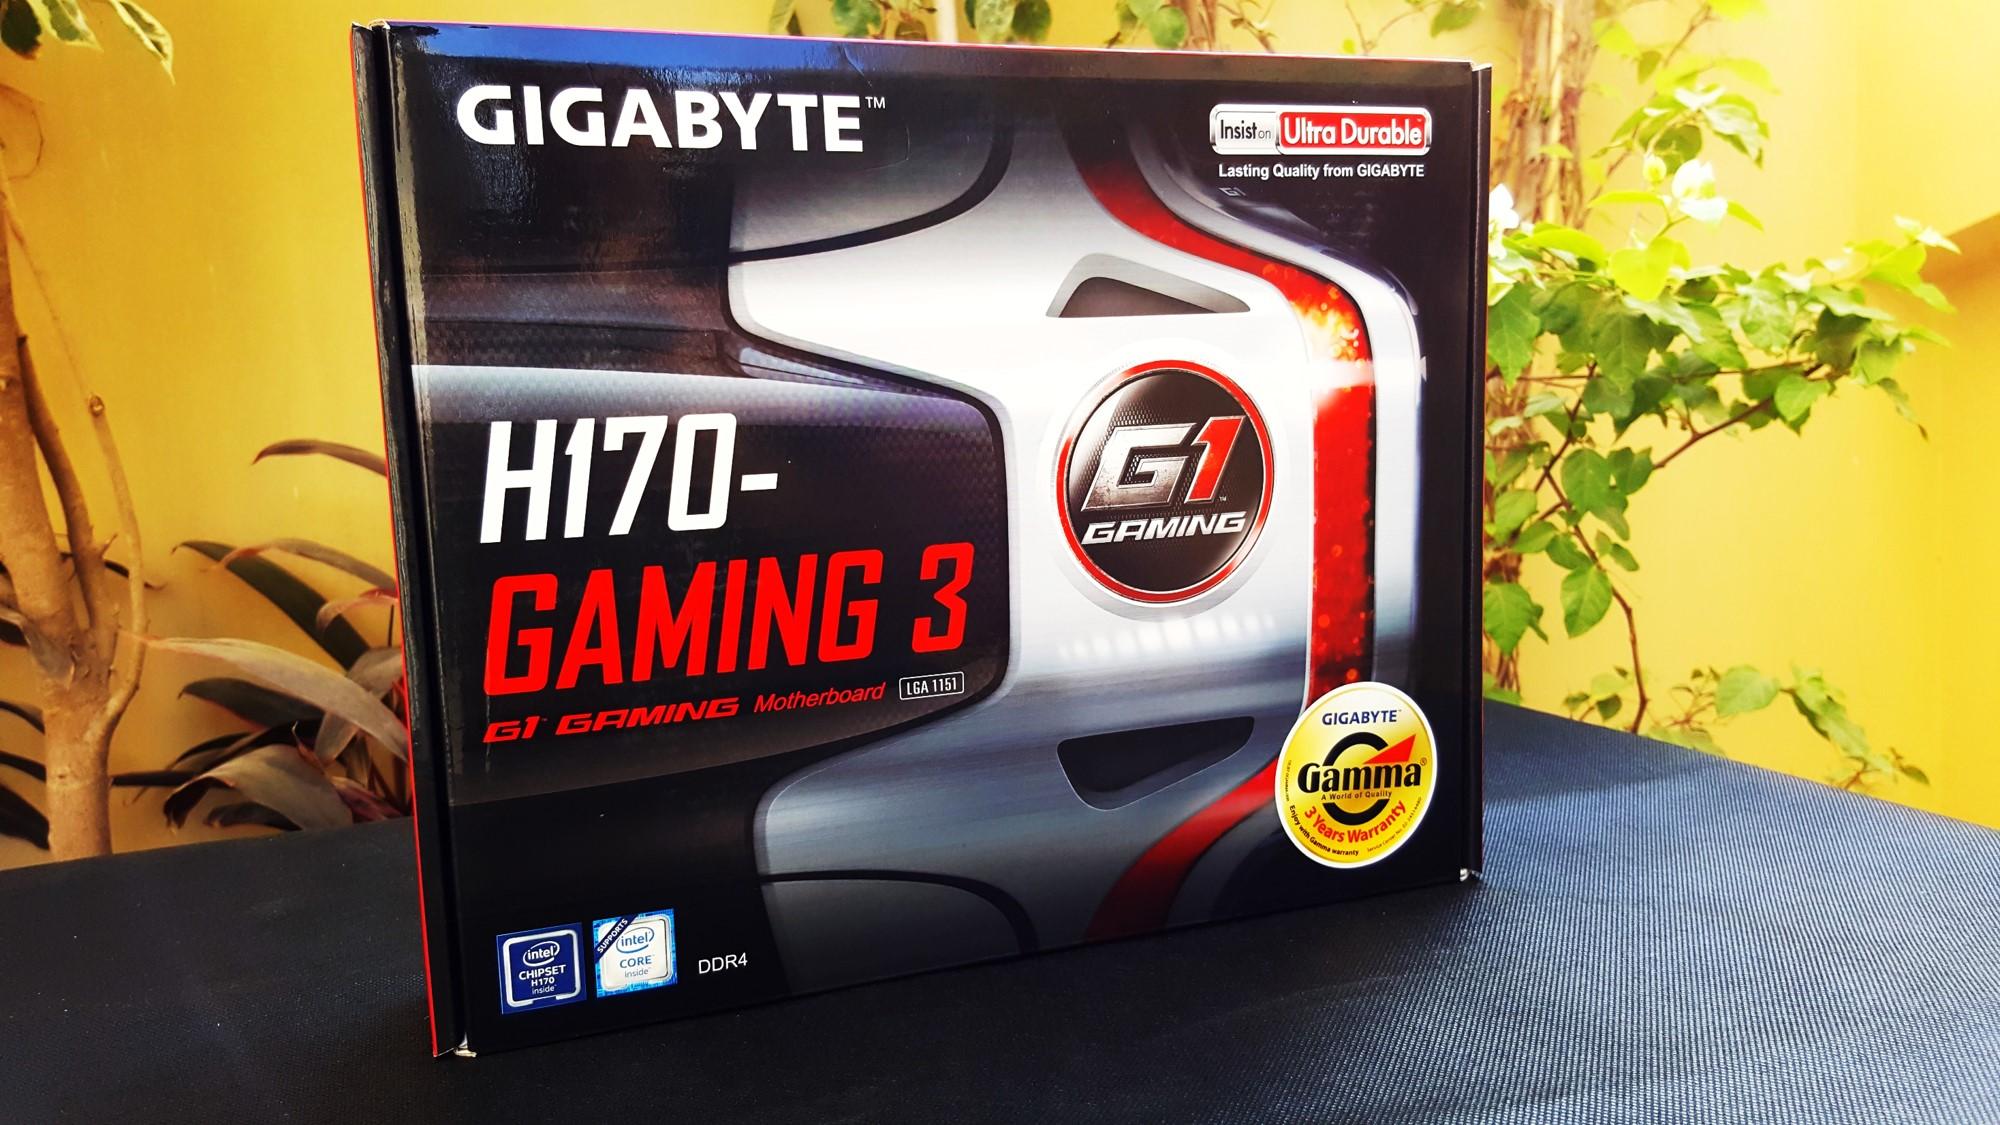 4-Gigabyte H170-Gaming 3 Box Front